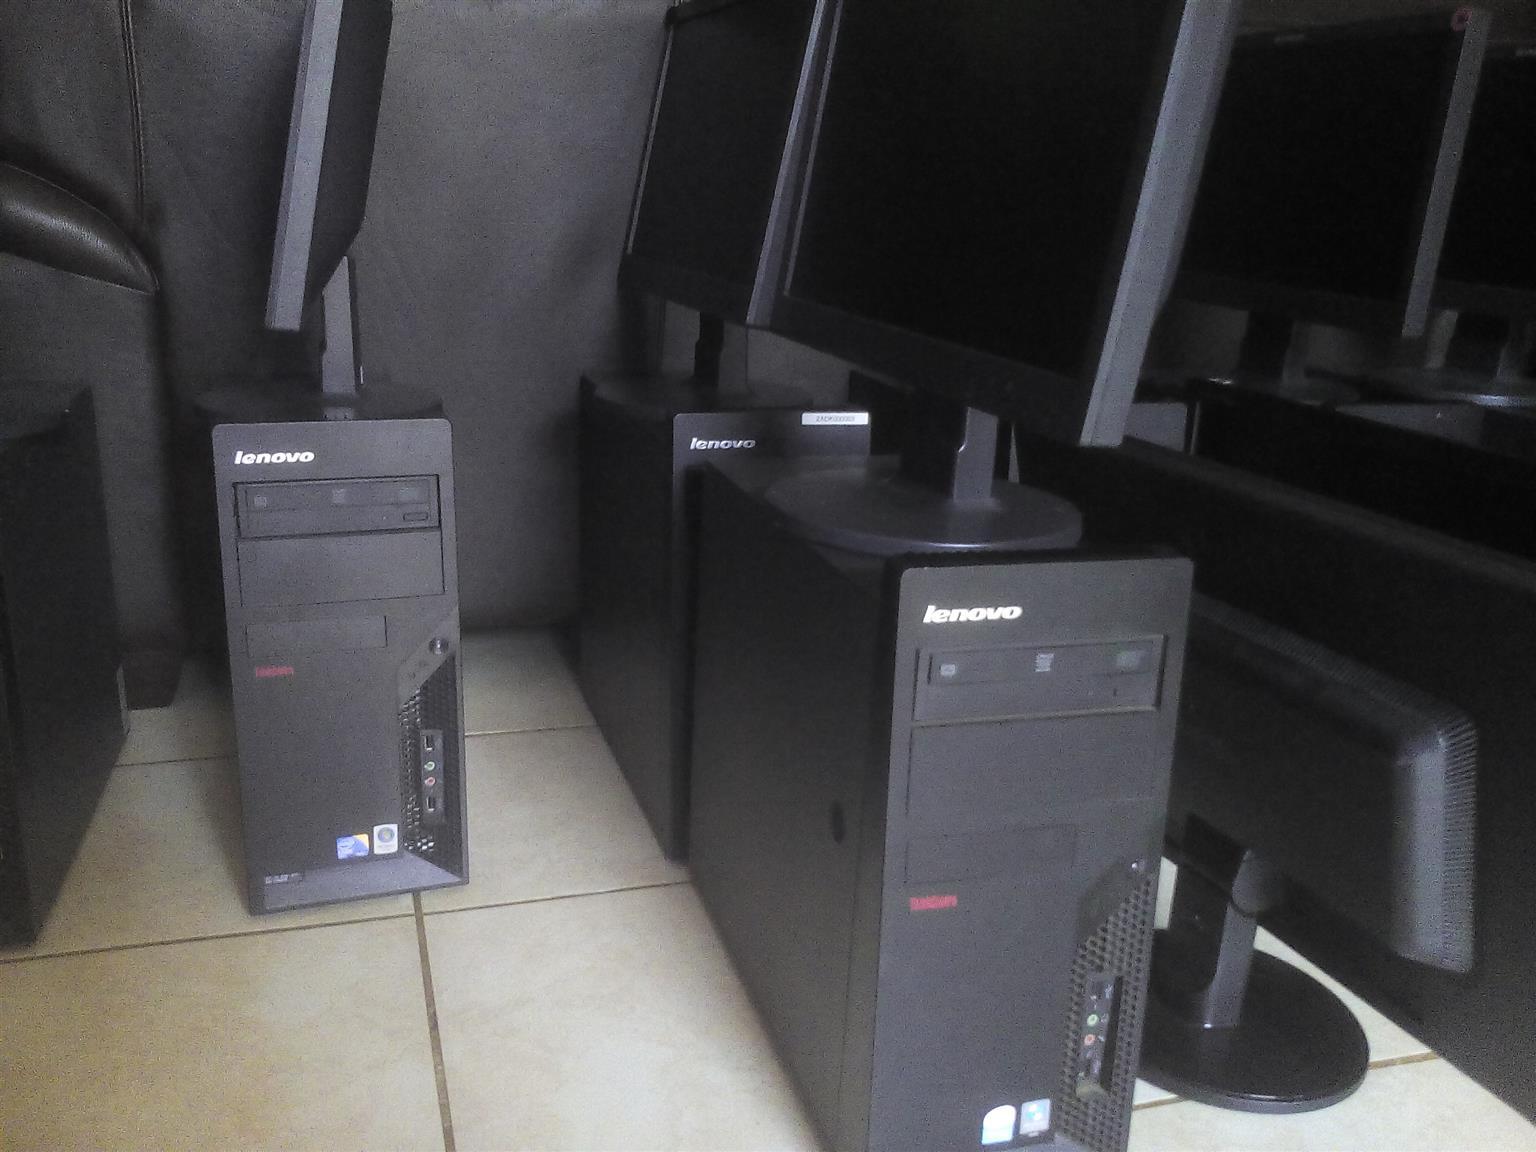 LENOVO COMPUTERS. COMPLETE SET